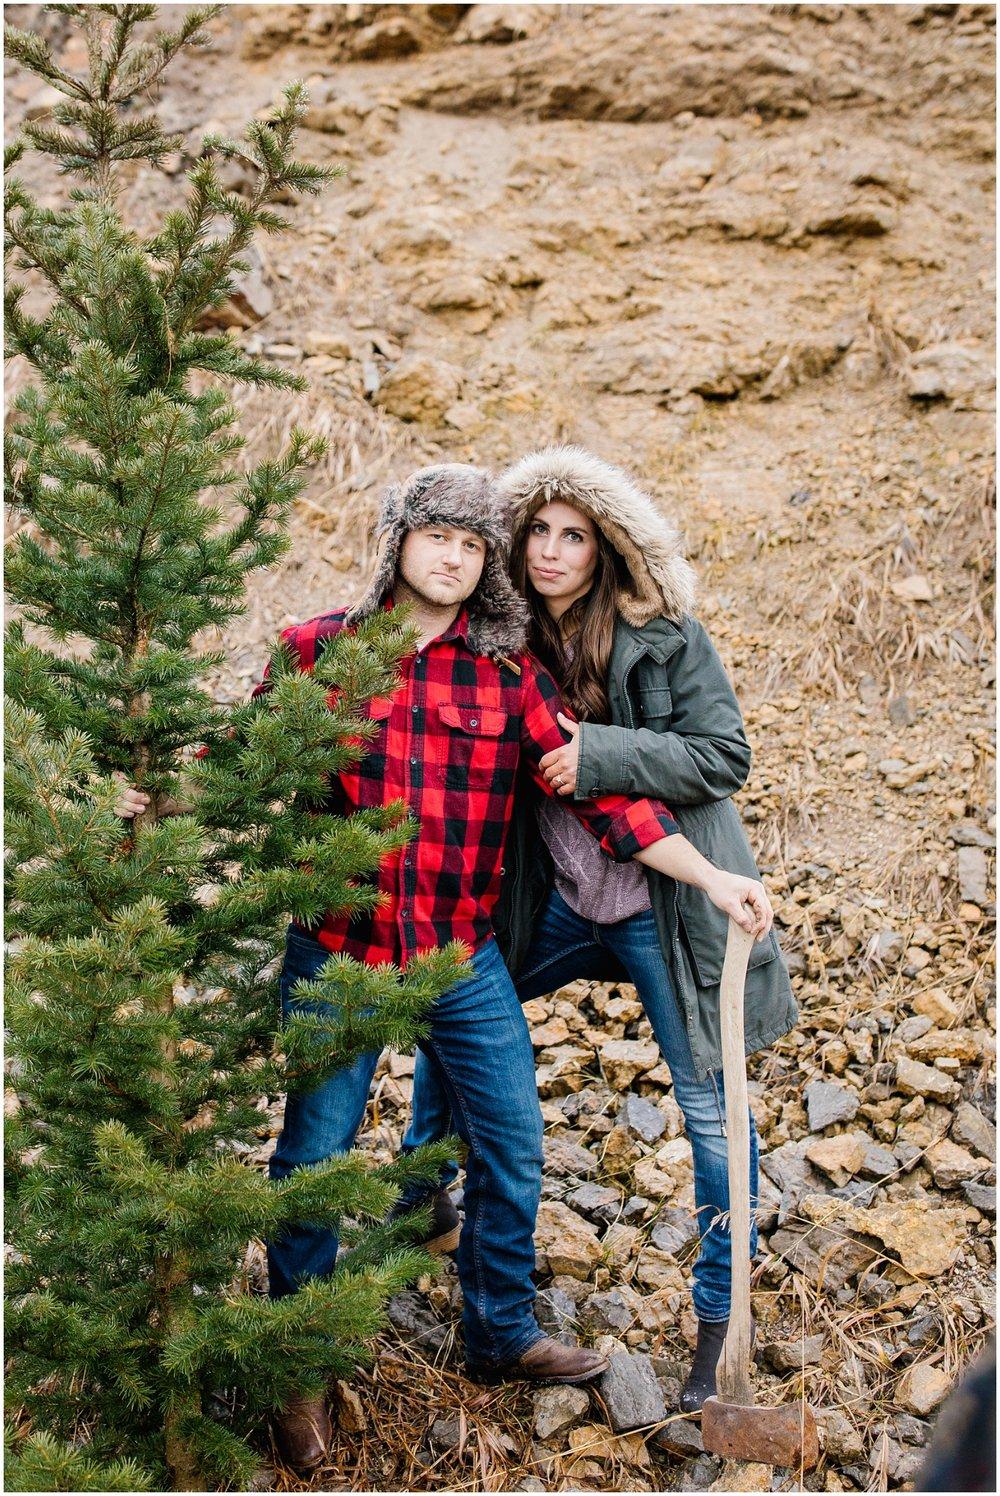 SSEngagements-115_Lizzie-B-Imagery-Utah-Wedding-Photographer-Park-City-Salt-Lake-City-Logan-Utah-Engagement-Session.jpg